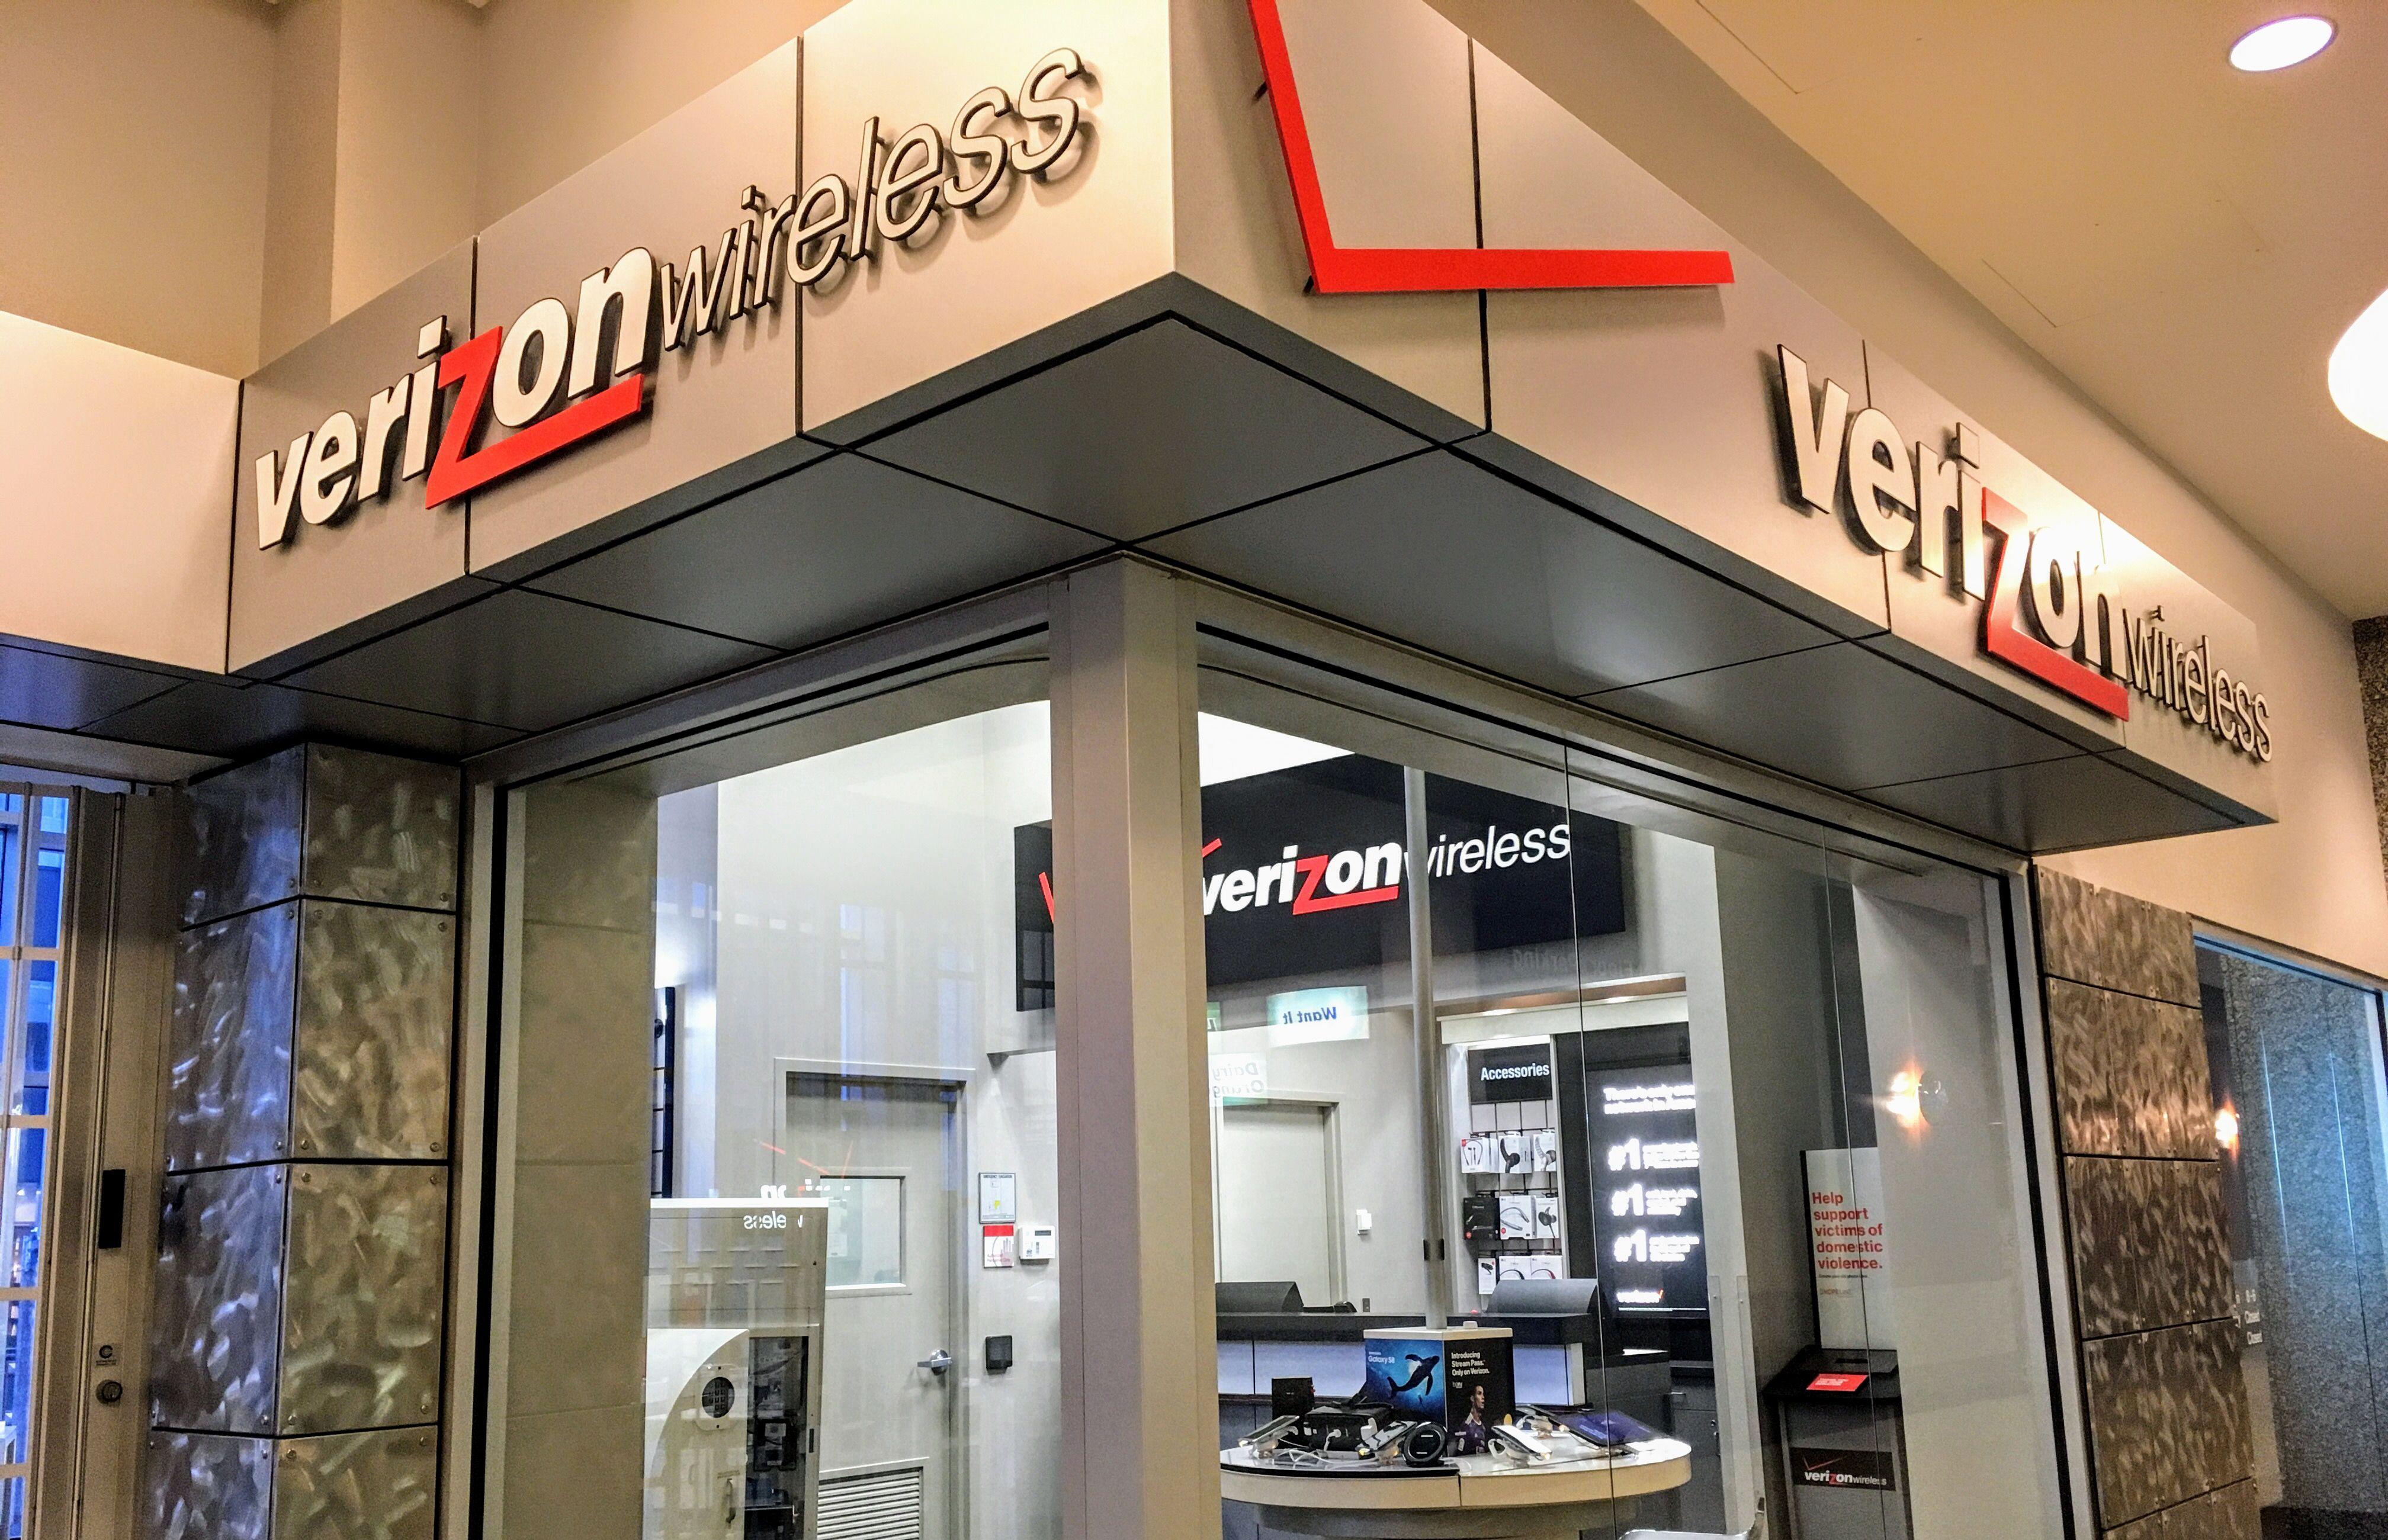 Verizon Wireless Store On The Skyway In The Us Bancorp Building Verizon Msp Minnenapolis Mylocalmn Localmn Photography Formas